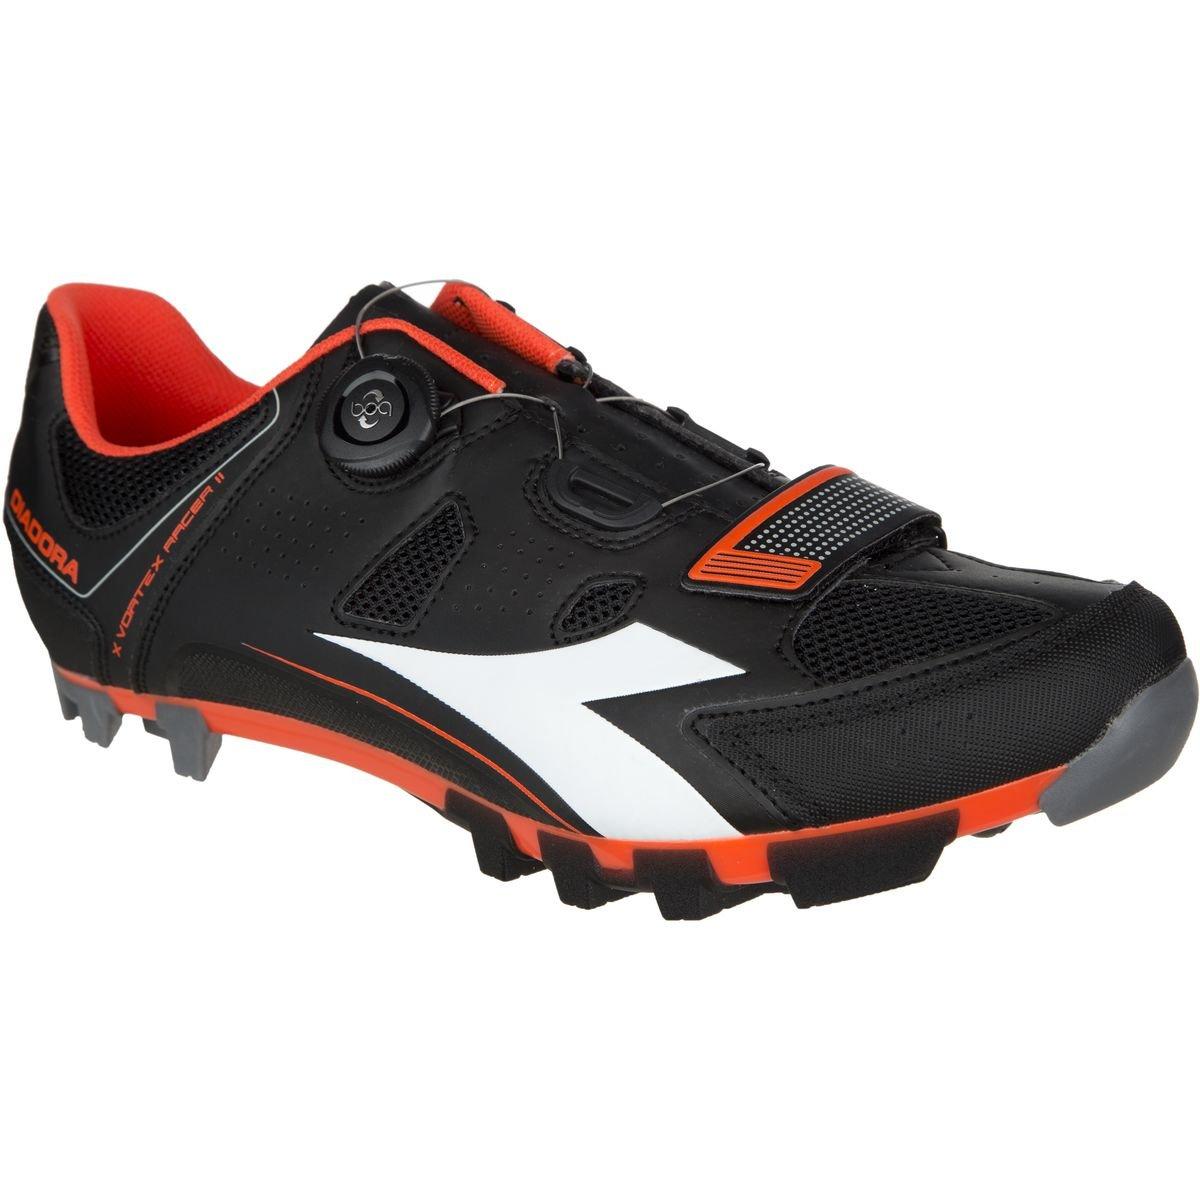 Diadora X Vortex-Racer II Shoes - Men's B01EBUSSRG 40|Black/White/Red Fluo